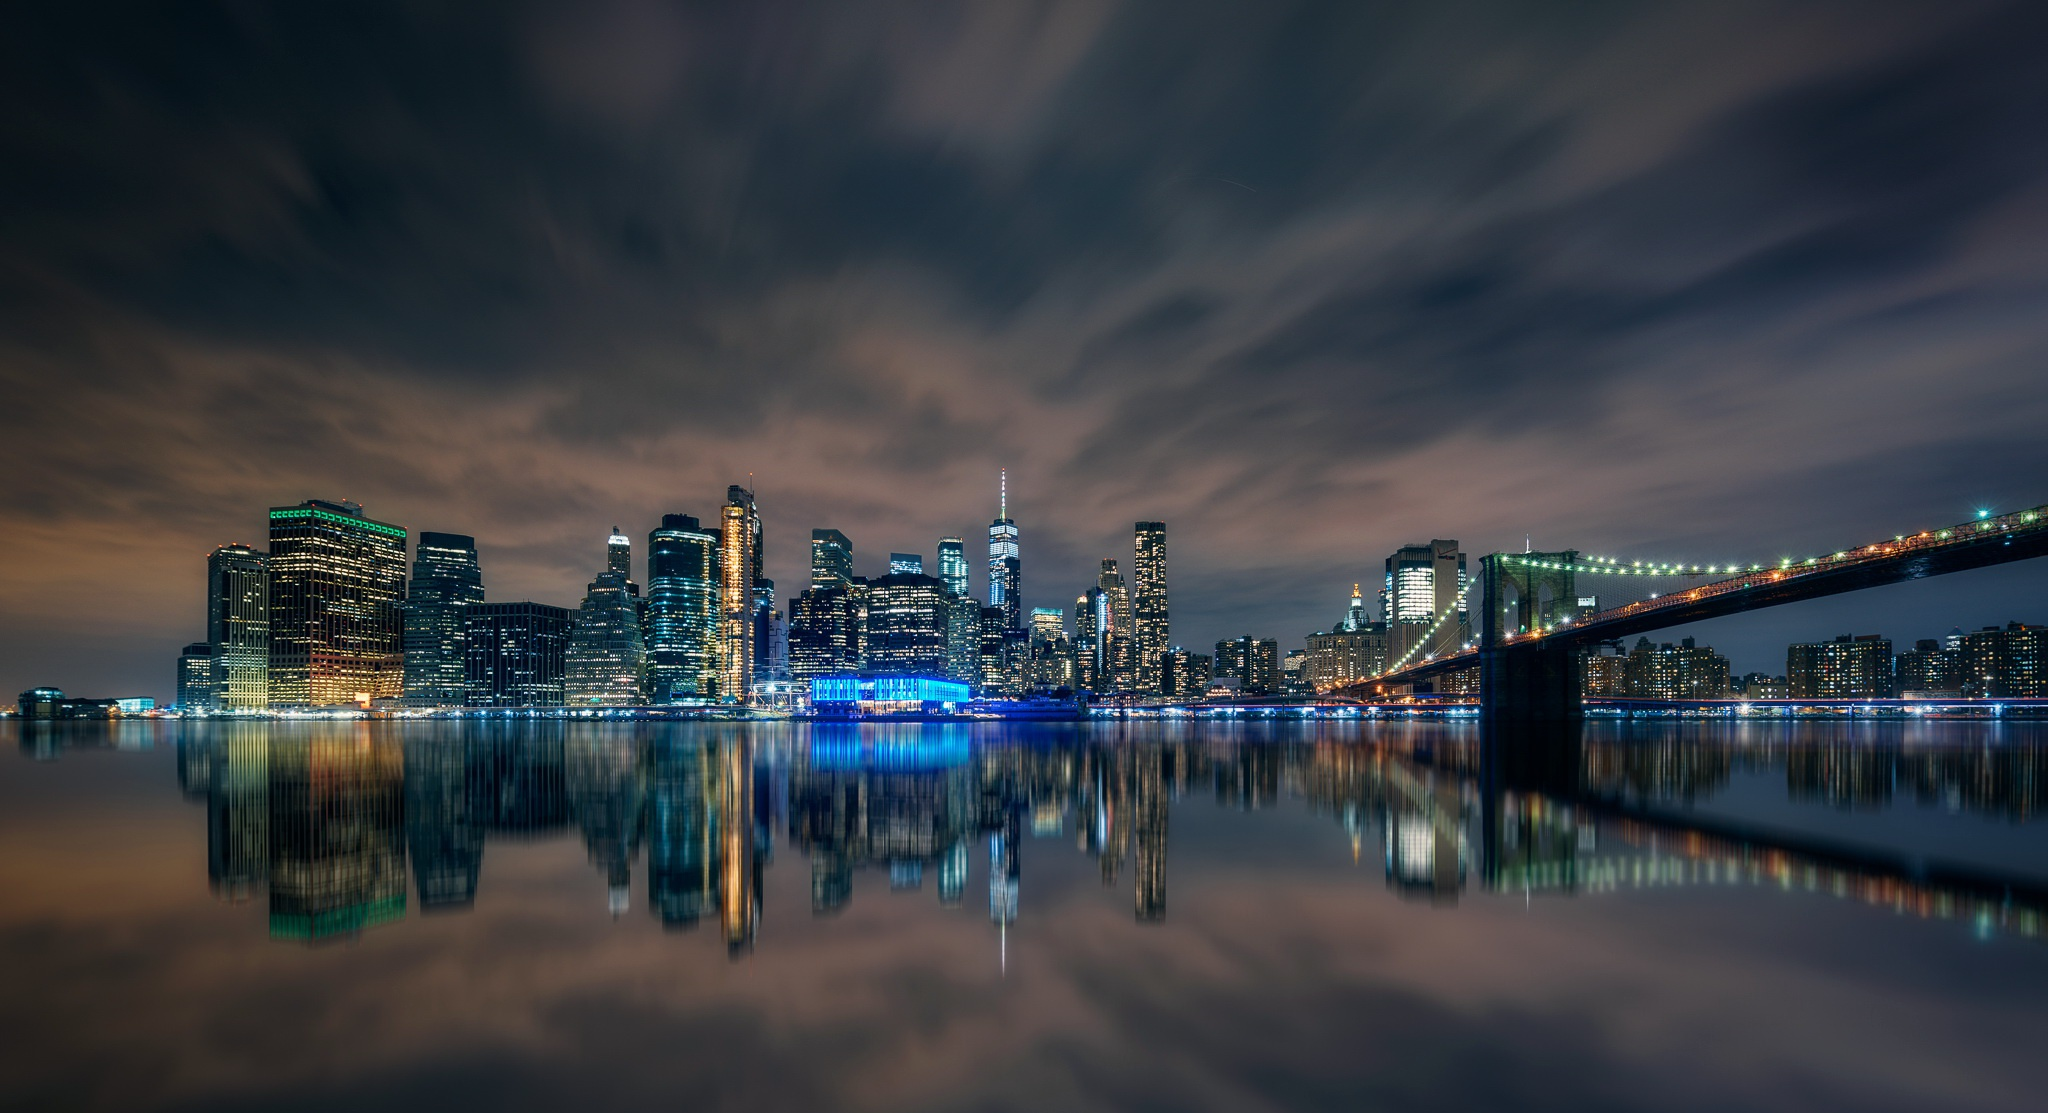 Bridge Brooklyn Bridge Building City Manhattan New York Night Reflection Skyscraper Usa 2048x1113